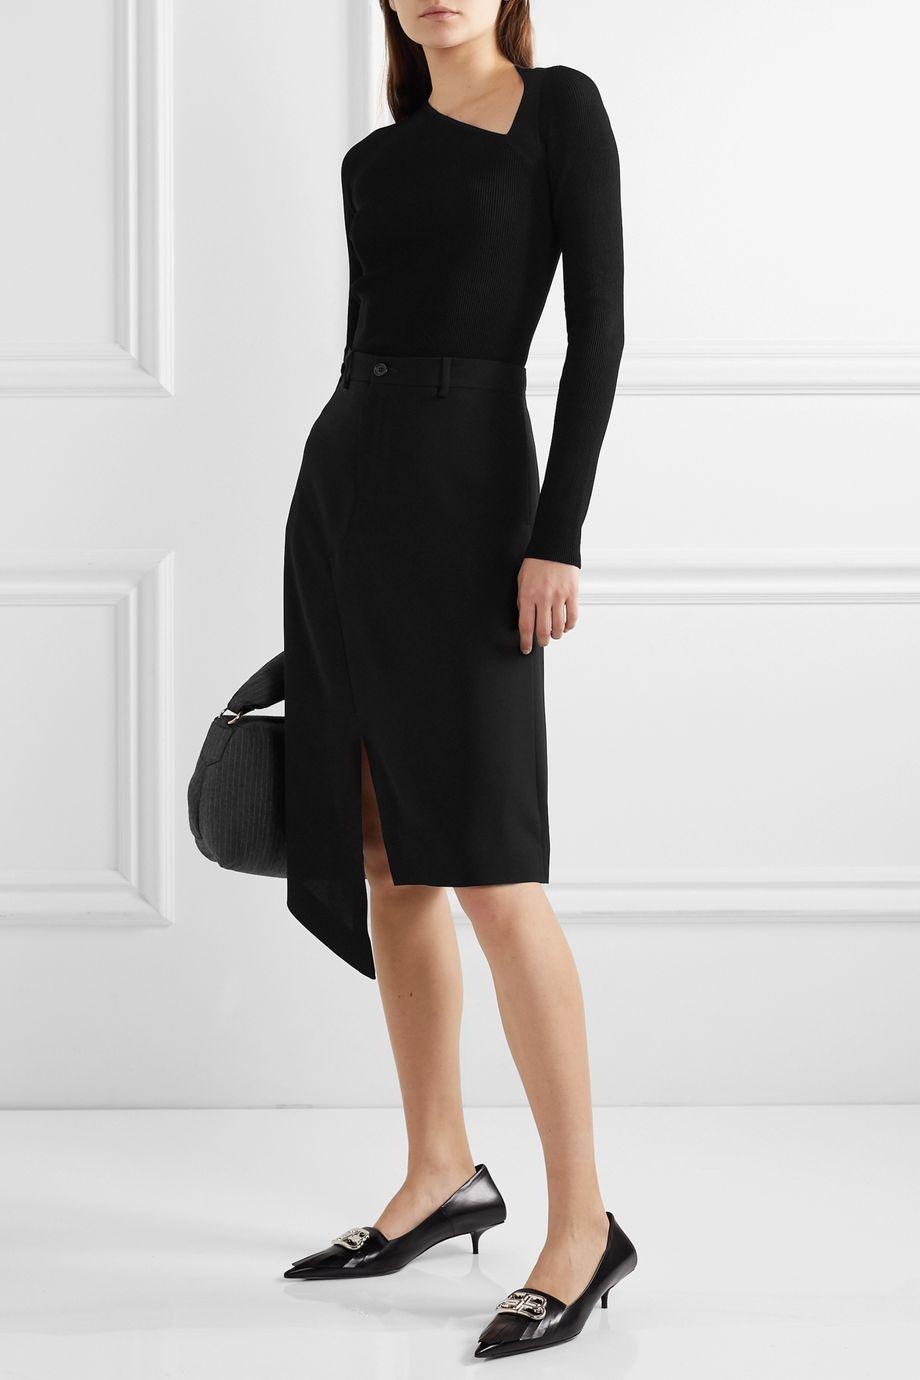 Maison Margiela 不对称绉纱半身裙